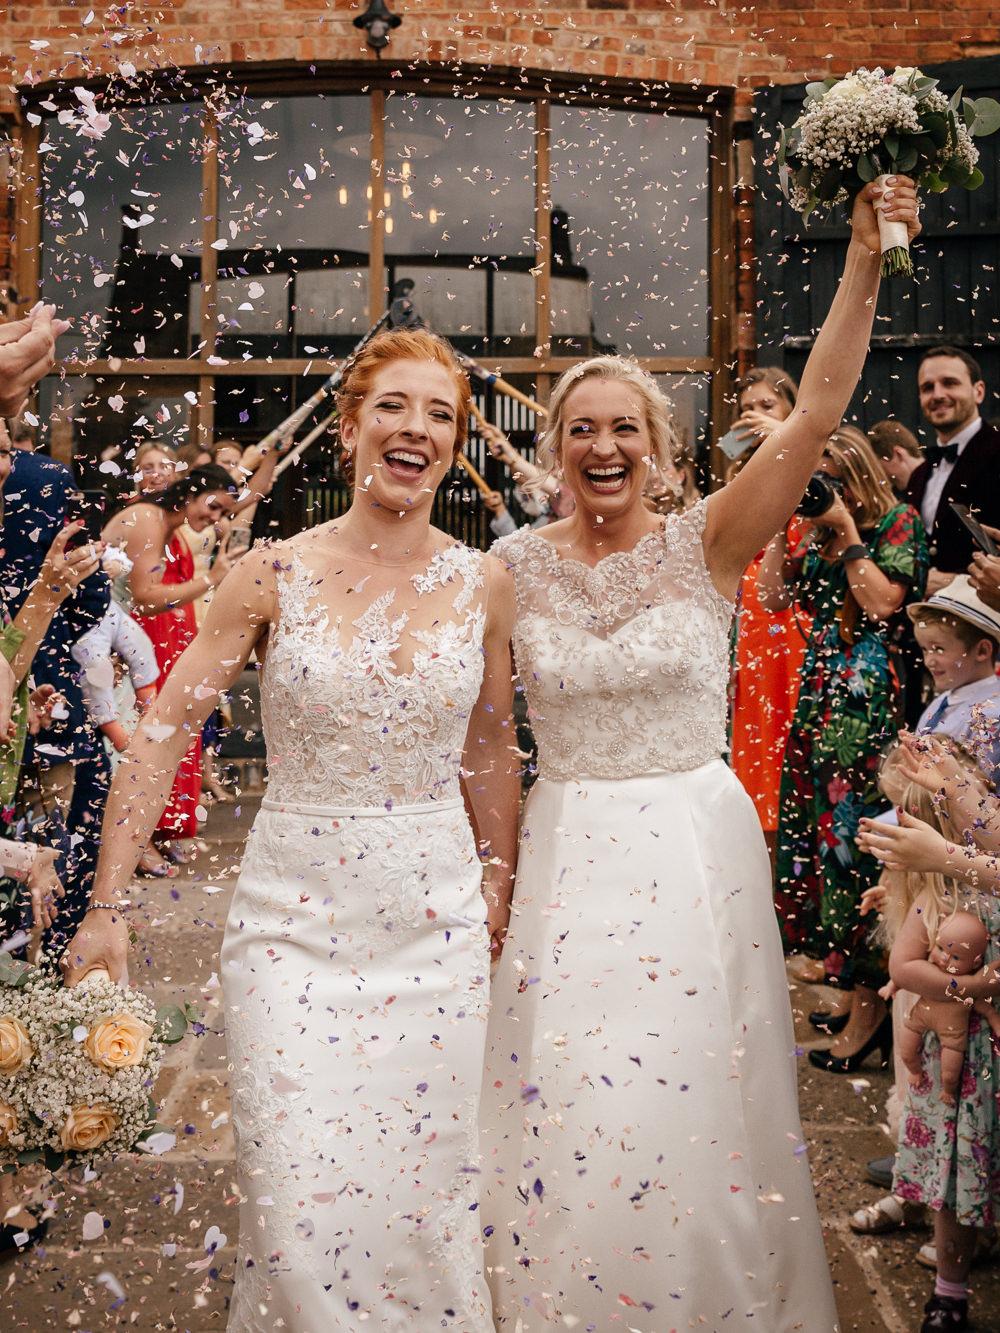 Bride Bridal Lace Embellished Dress Gown Cap Sleeve Halter Neck Confetti Mickleton Hills Farm Wedding Jules Barron Photography